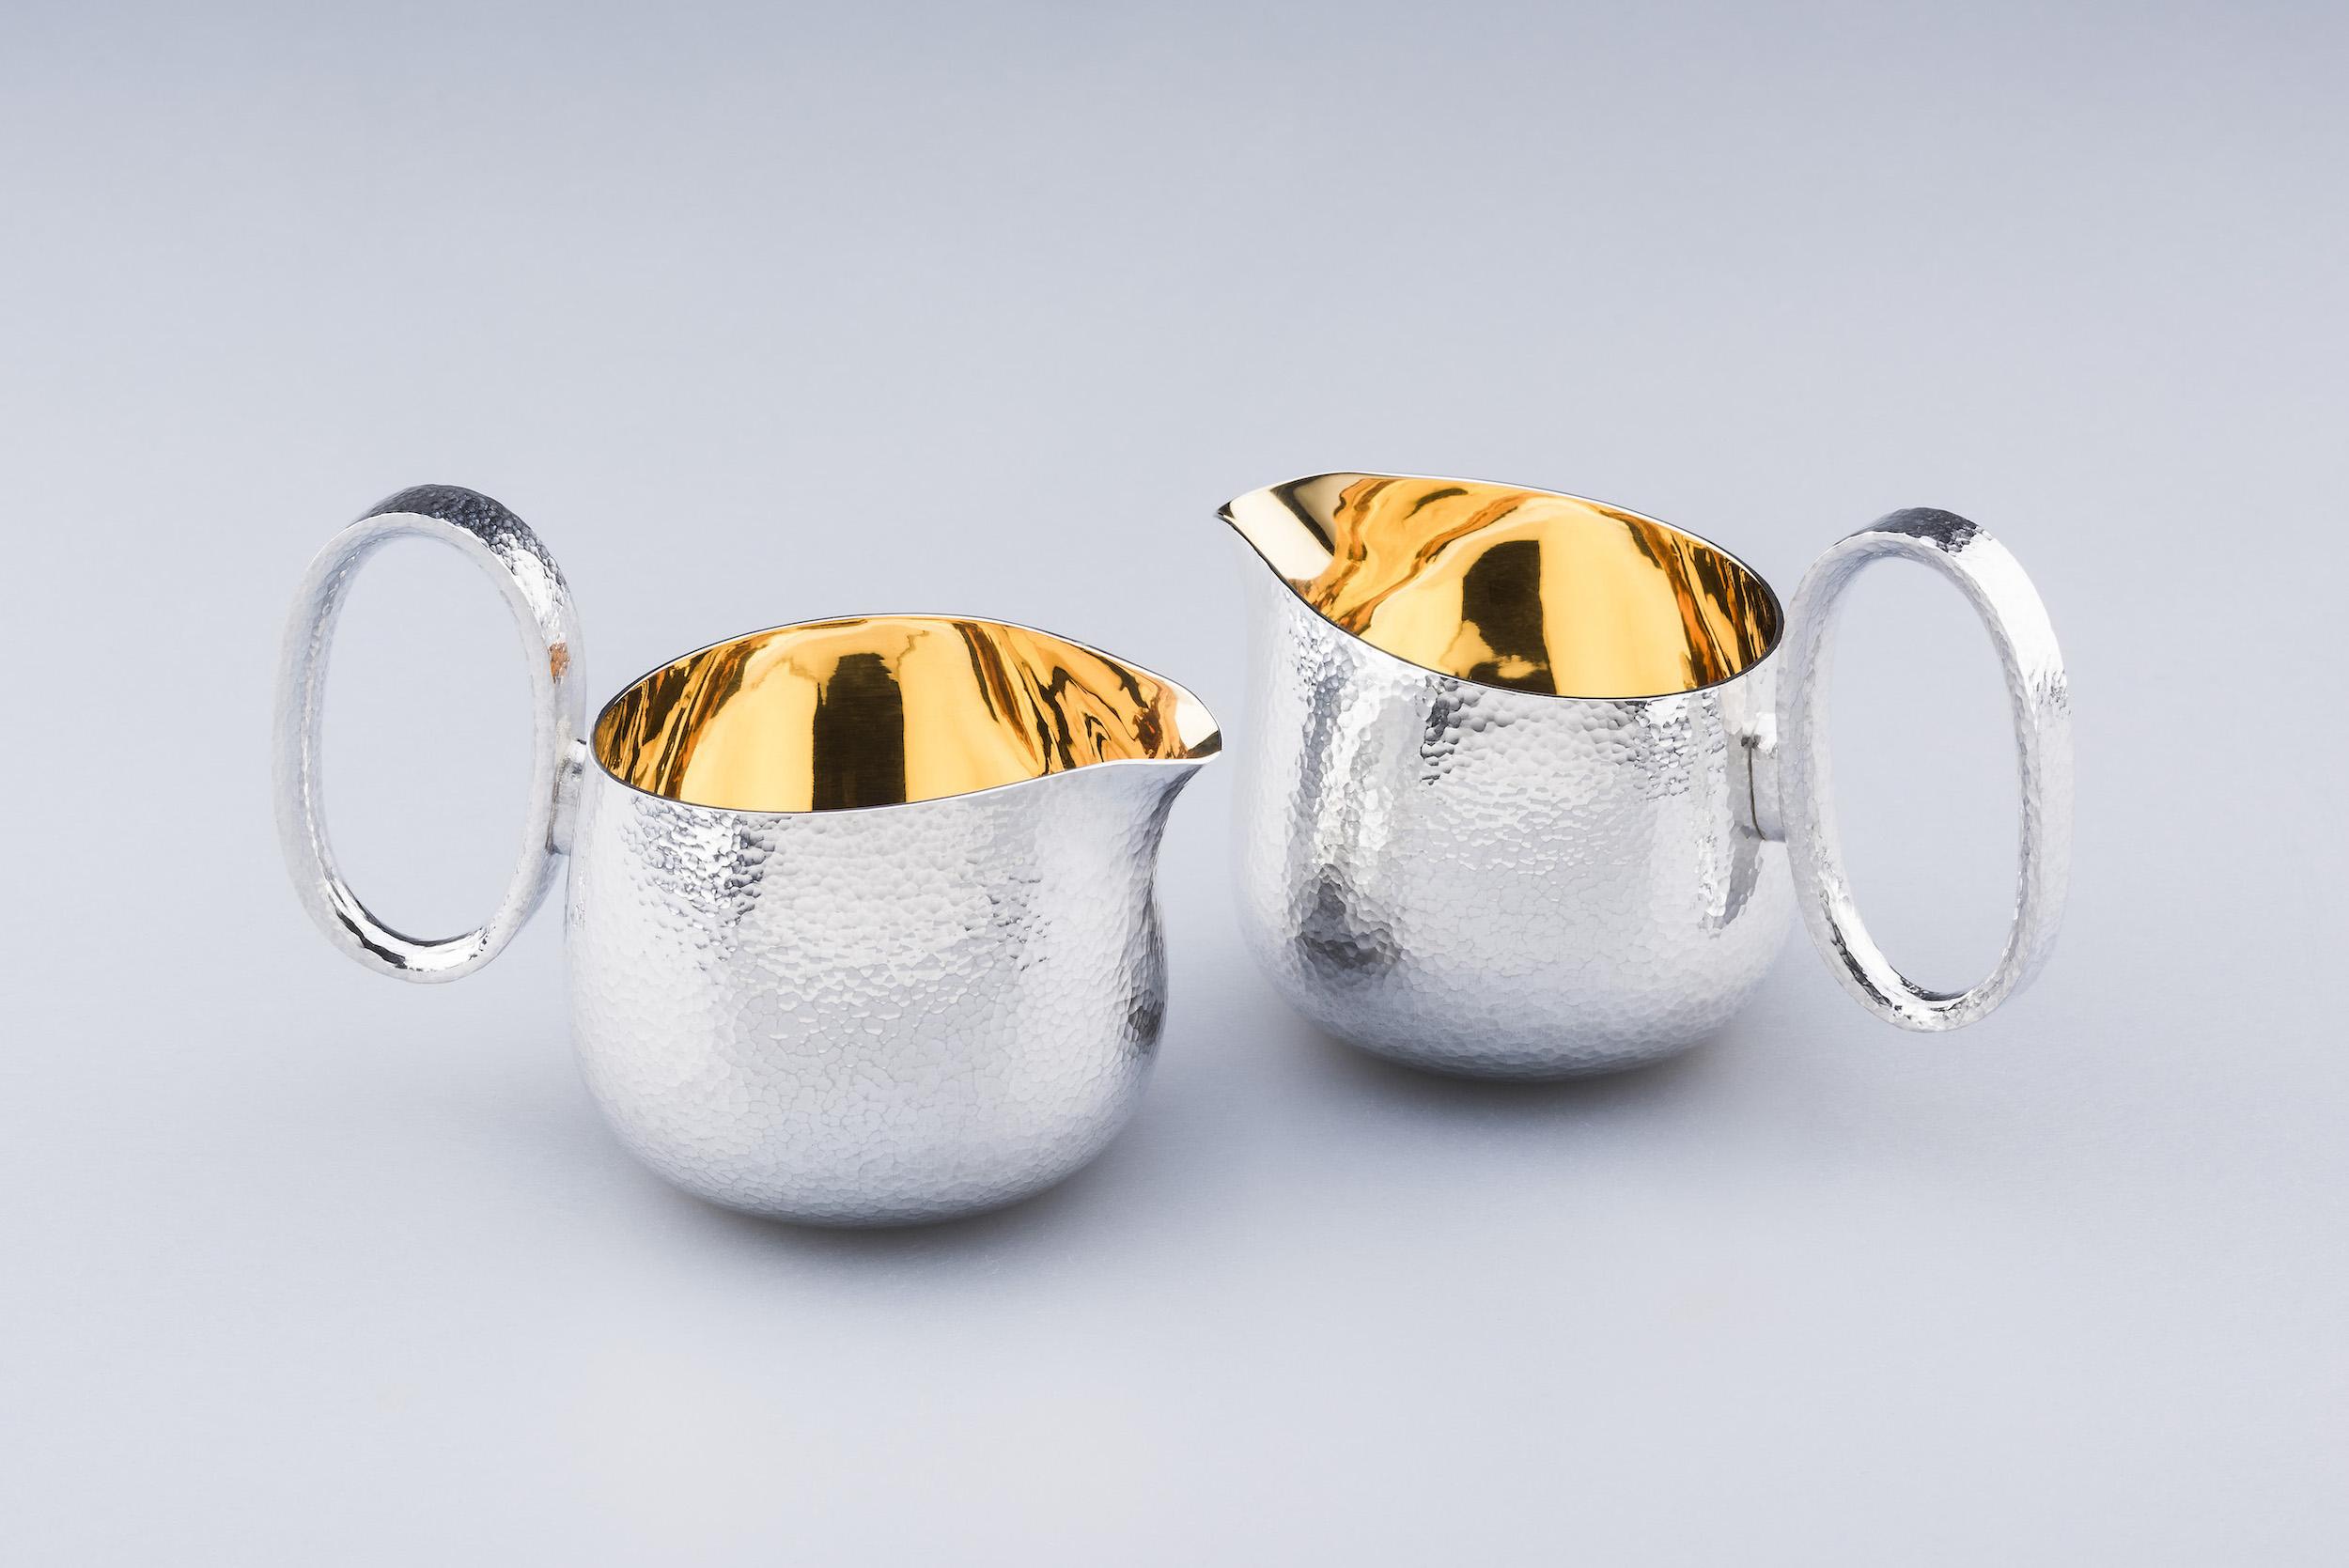 pair_of_cream_jugs.jpg